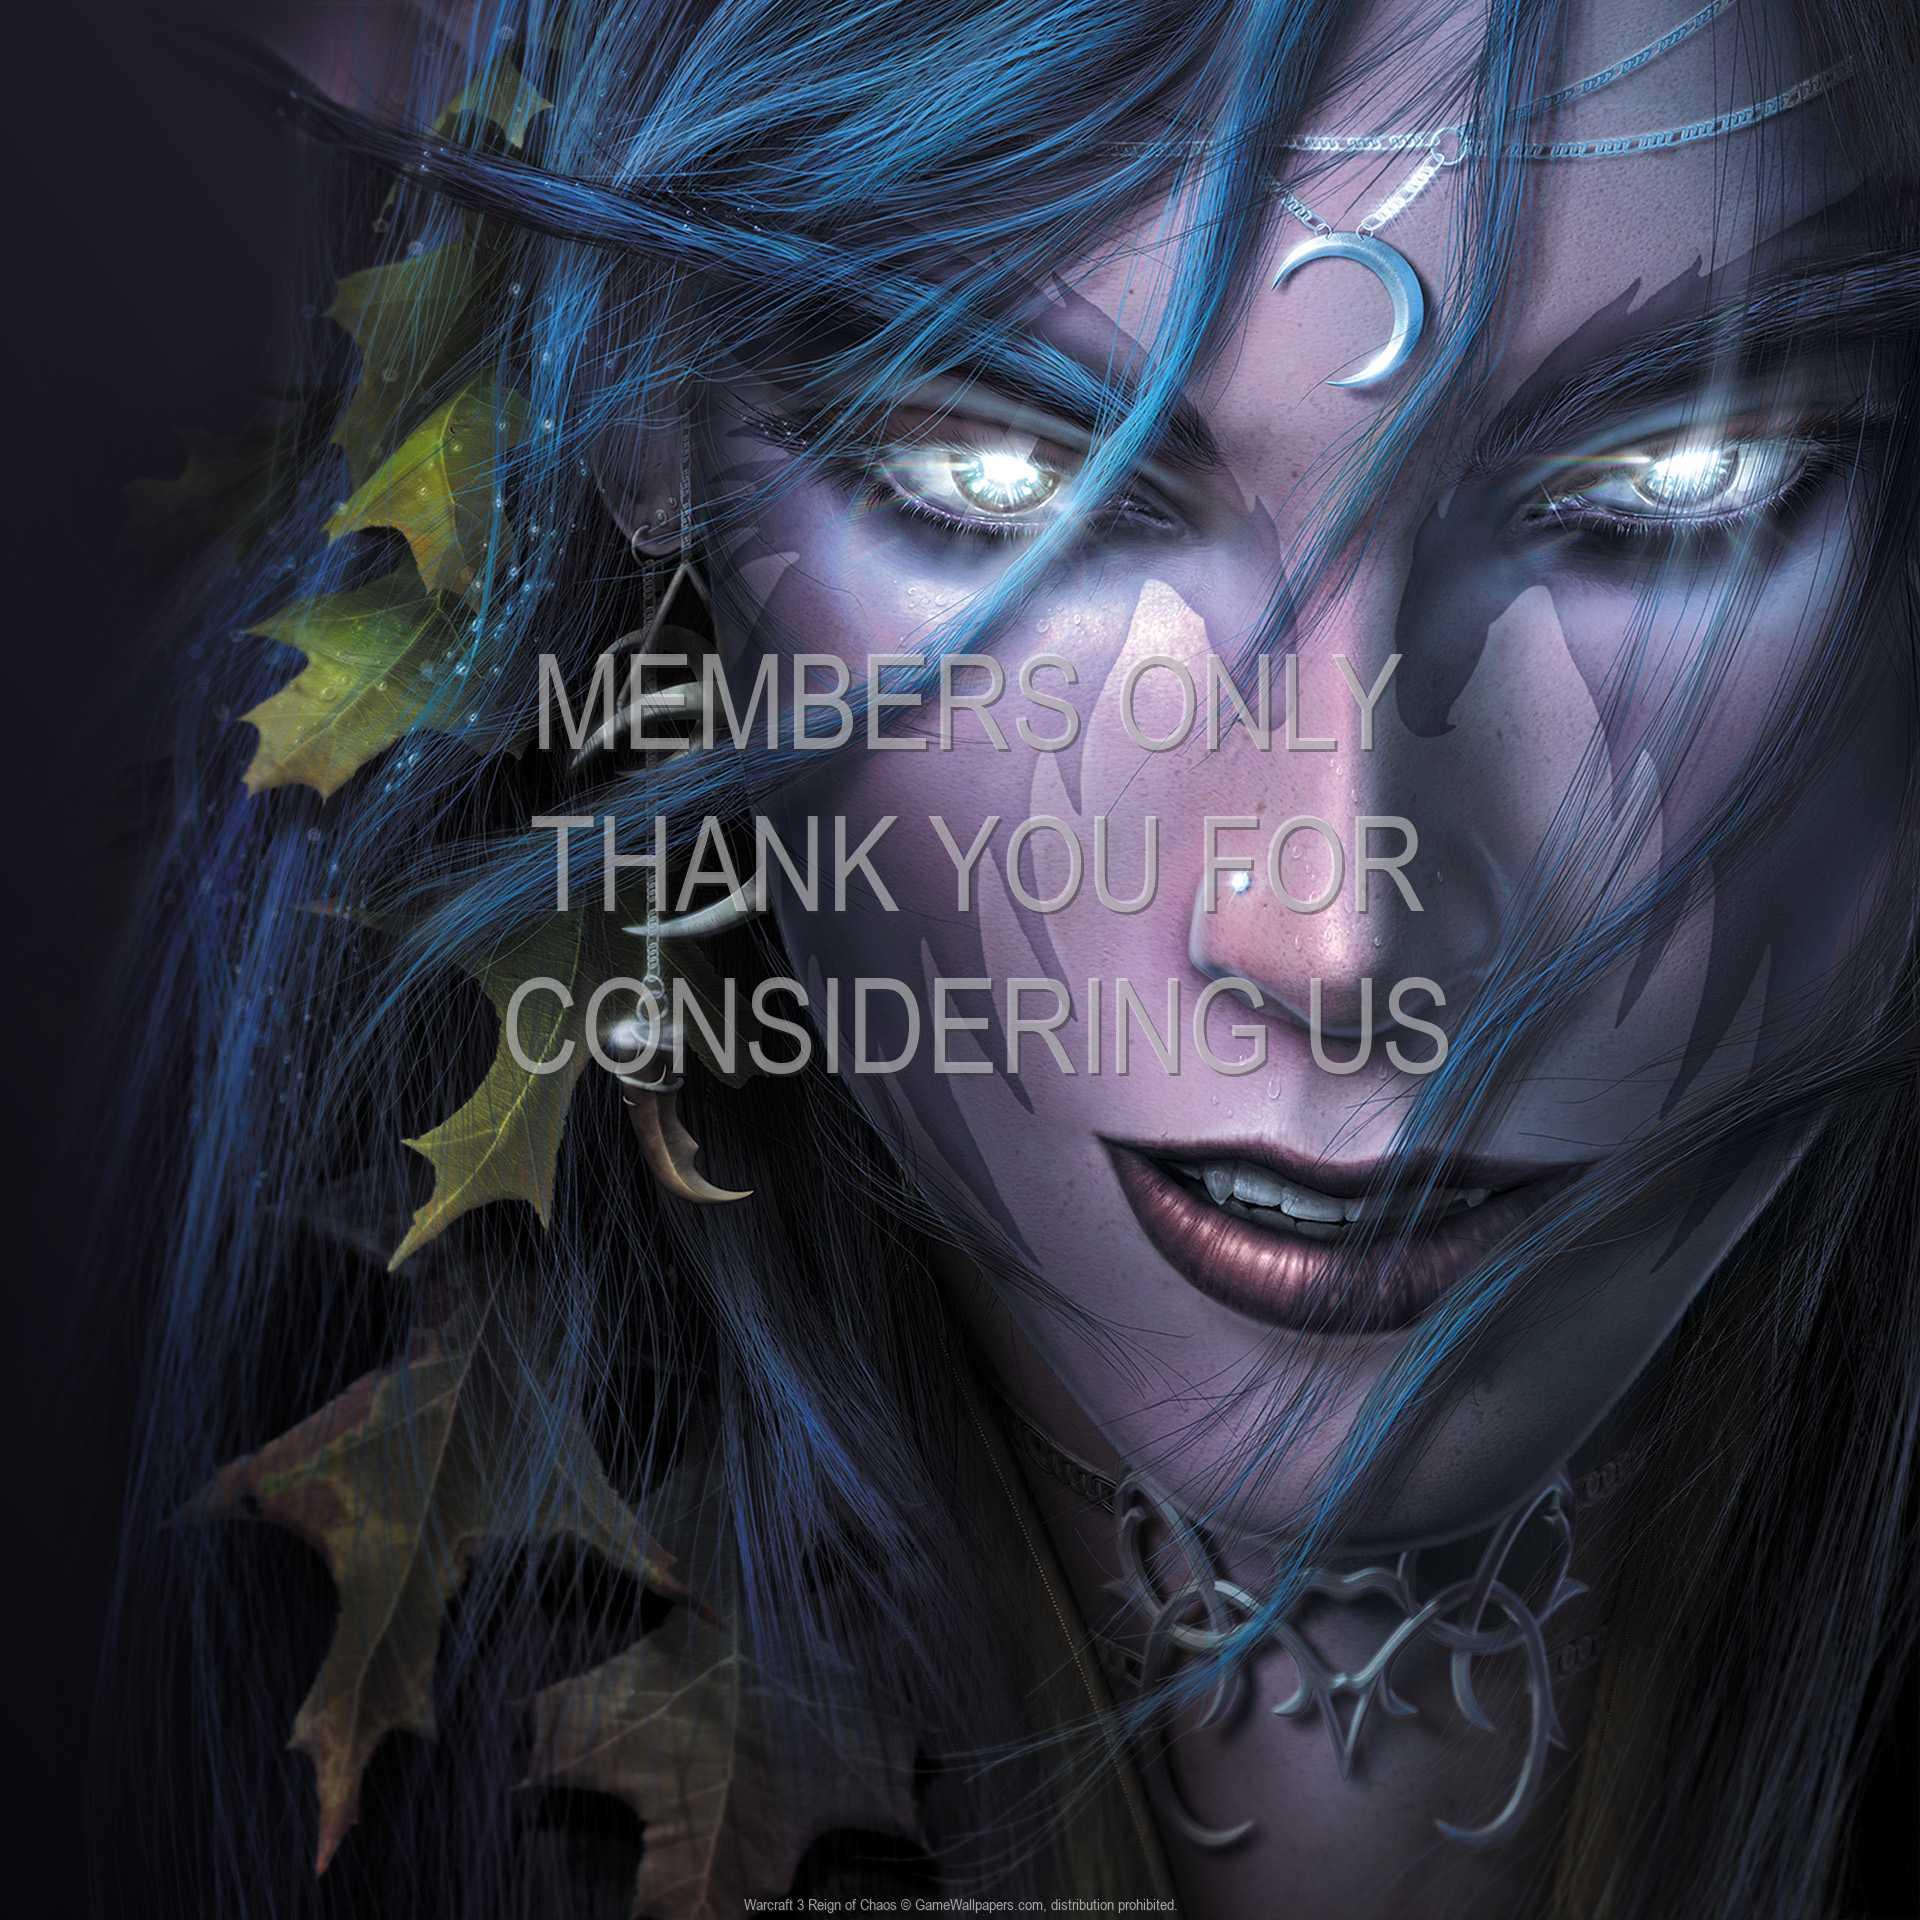 Warcraft 3: Reign of Chaos 1080p Horizontal Handy Hintergrundbild 22